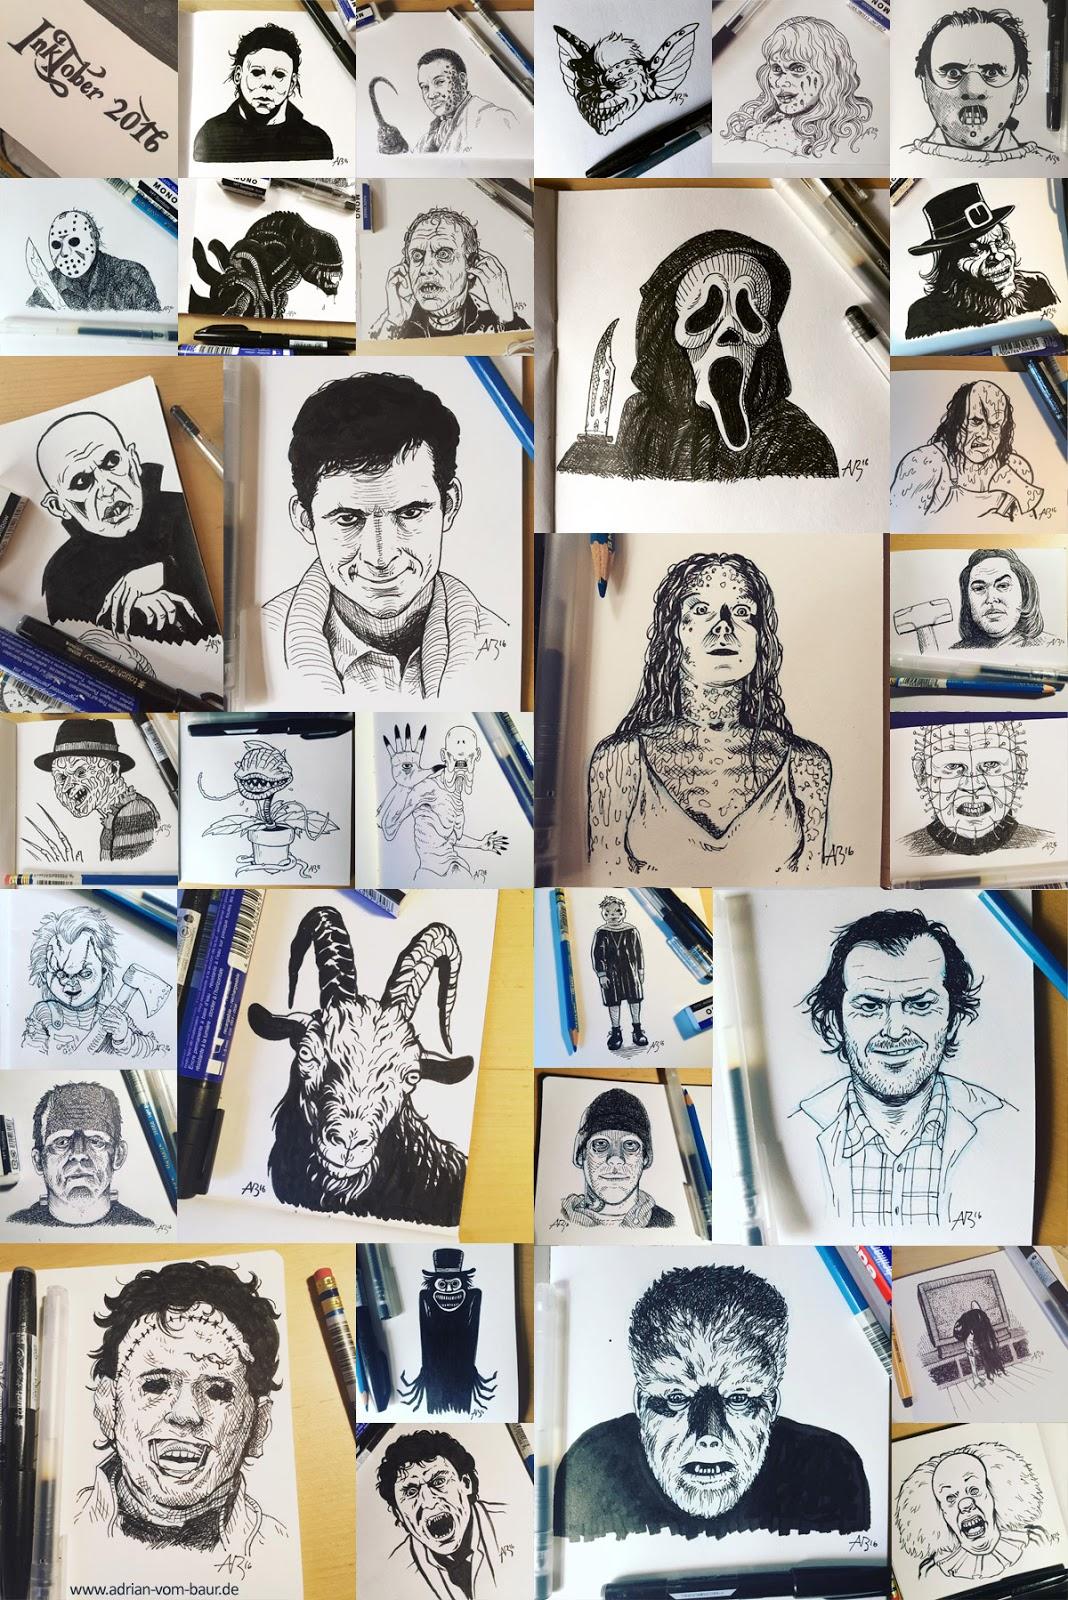 Adrian Vom Baur Comics Illustrations And Other Art Stuff 2016